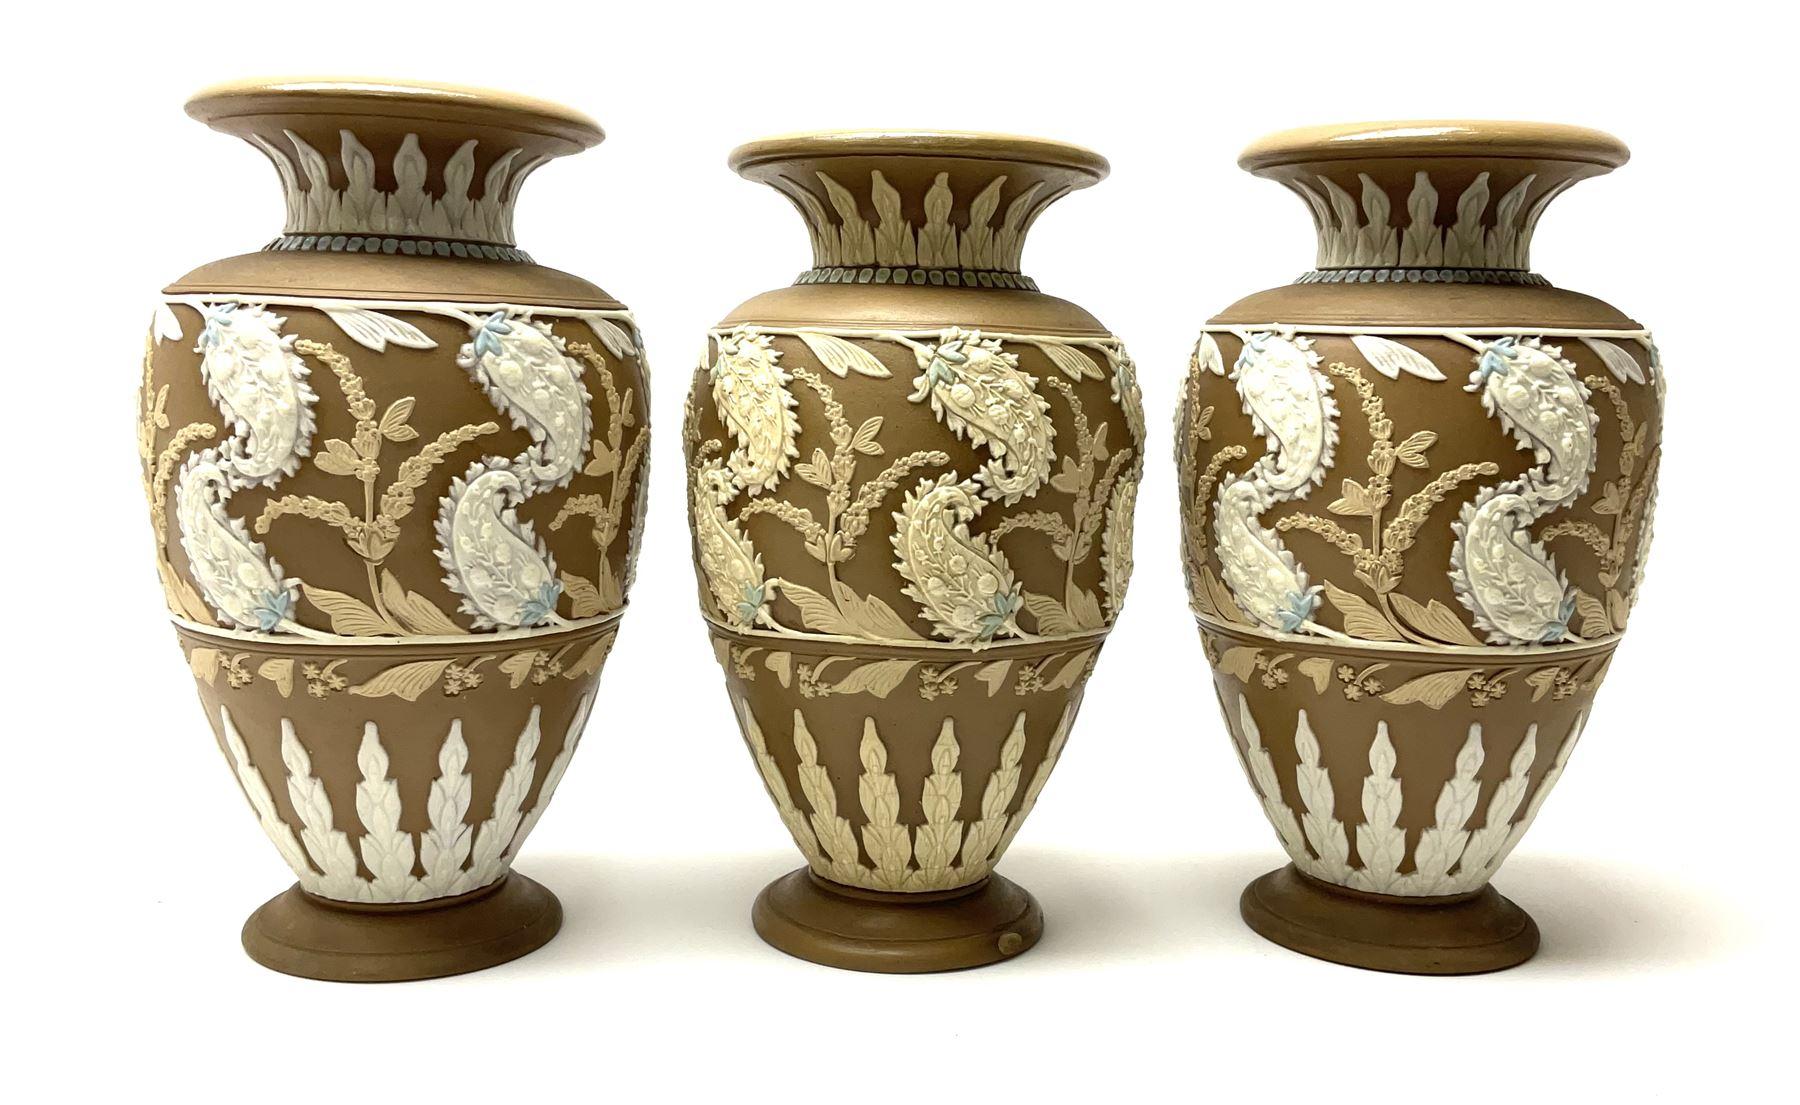 A set of three 19th century Doulton Lambeth silicon ware vases